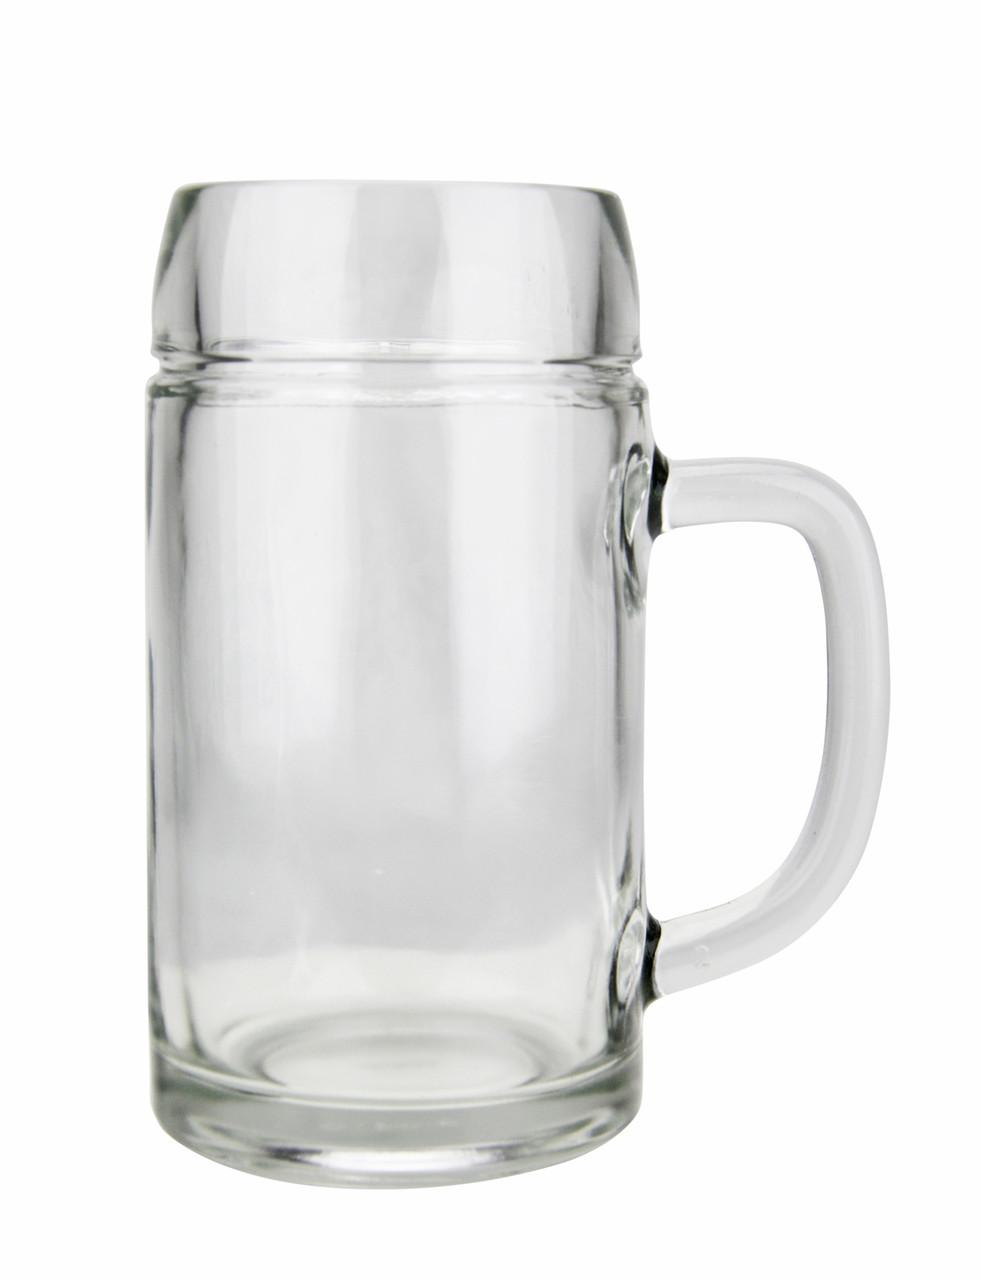 .5L Styria Smooth Body Oktoberfest Glass Beer Mug, Empty